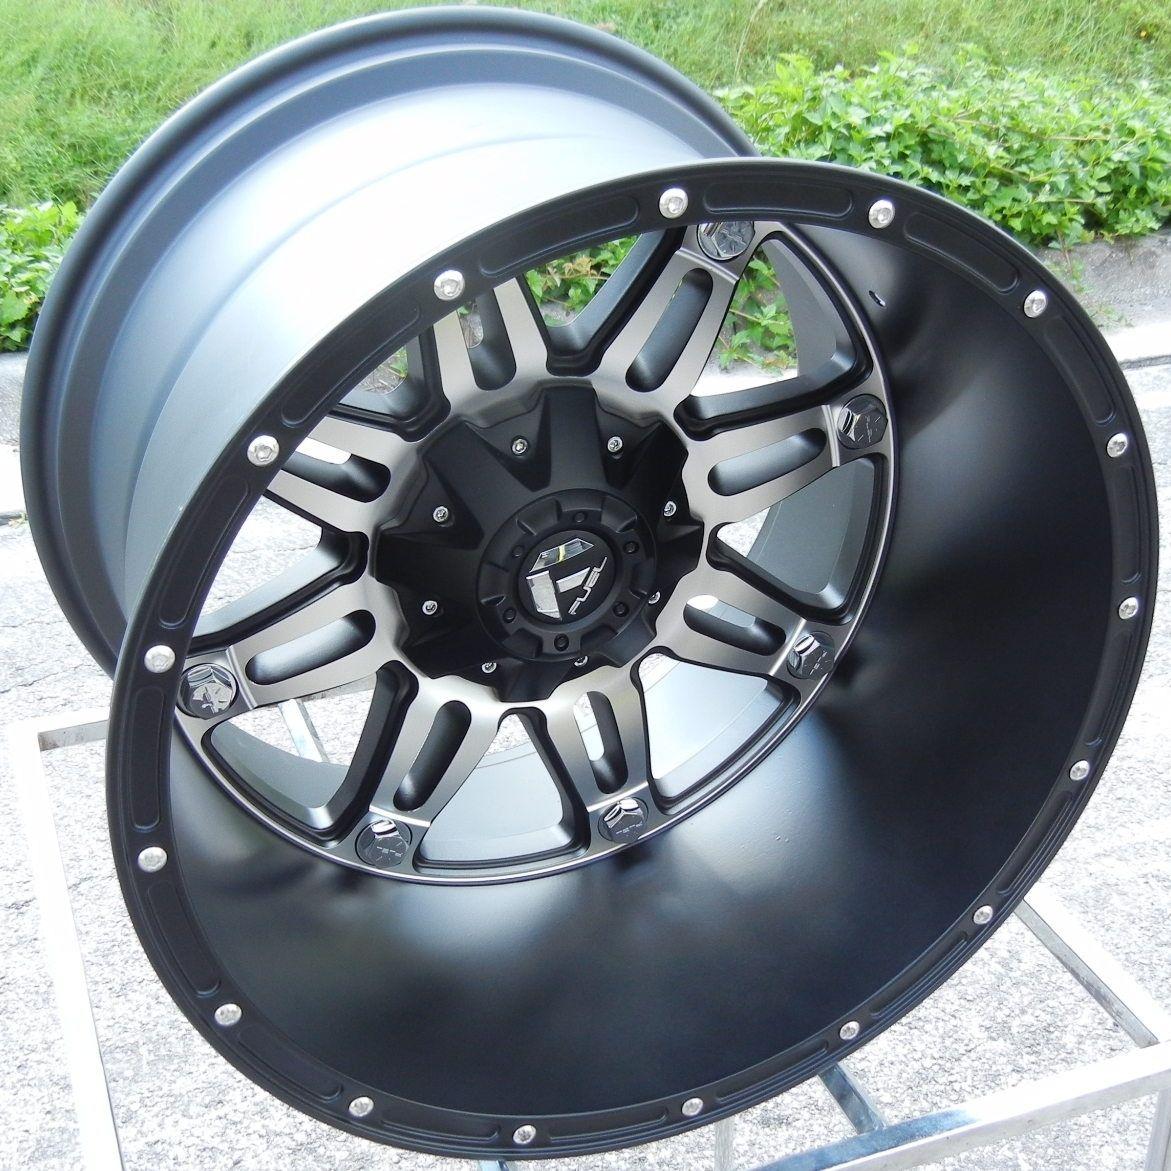 20x14 Black Machined Fuel Hostage Wheels Rim Chevy Silverado GMC 1500